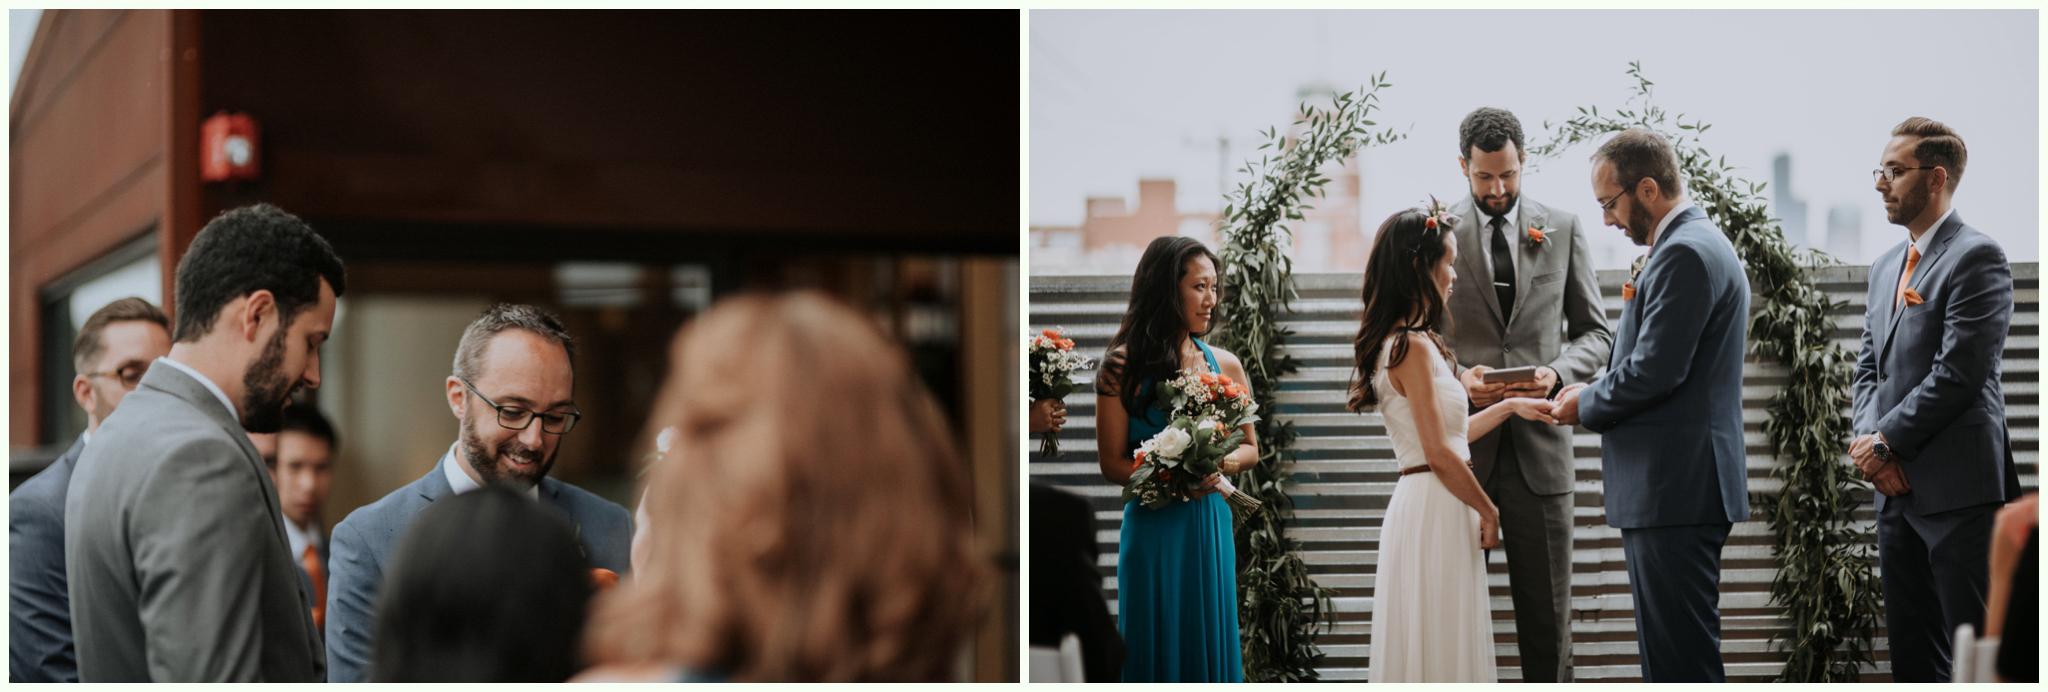 within-sodo-june-wedding-seattle-photographer-caitlyn-nikula-63.jpg